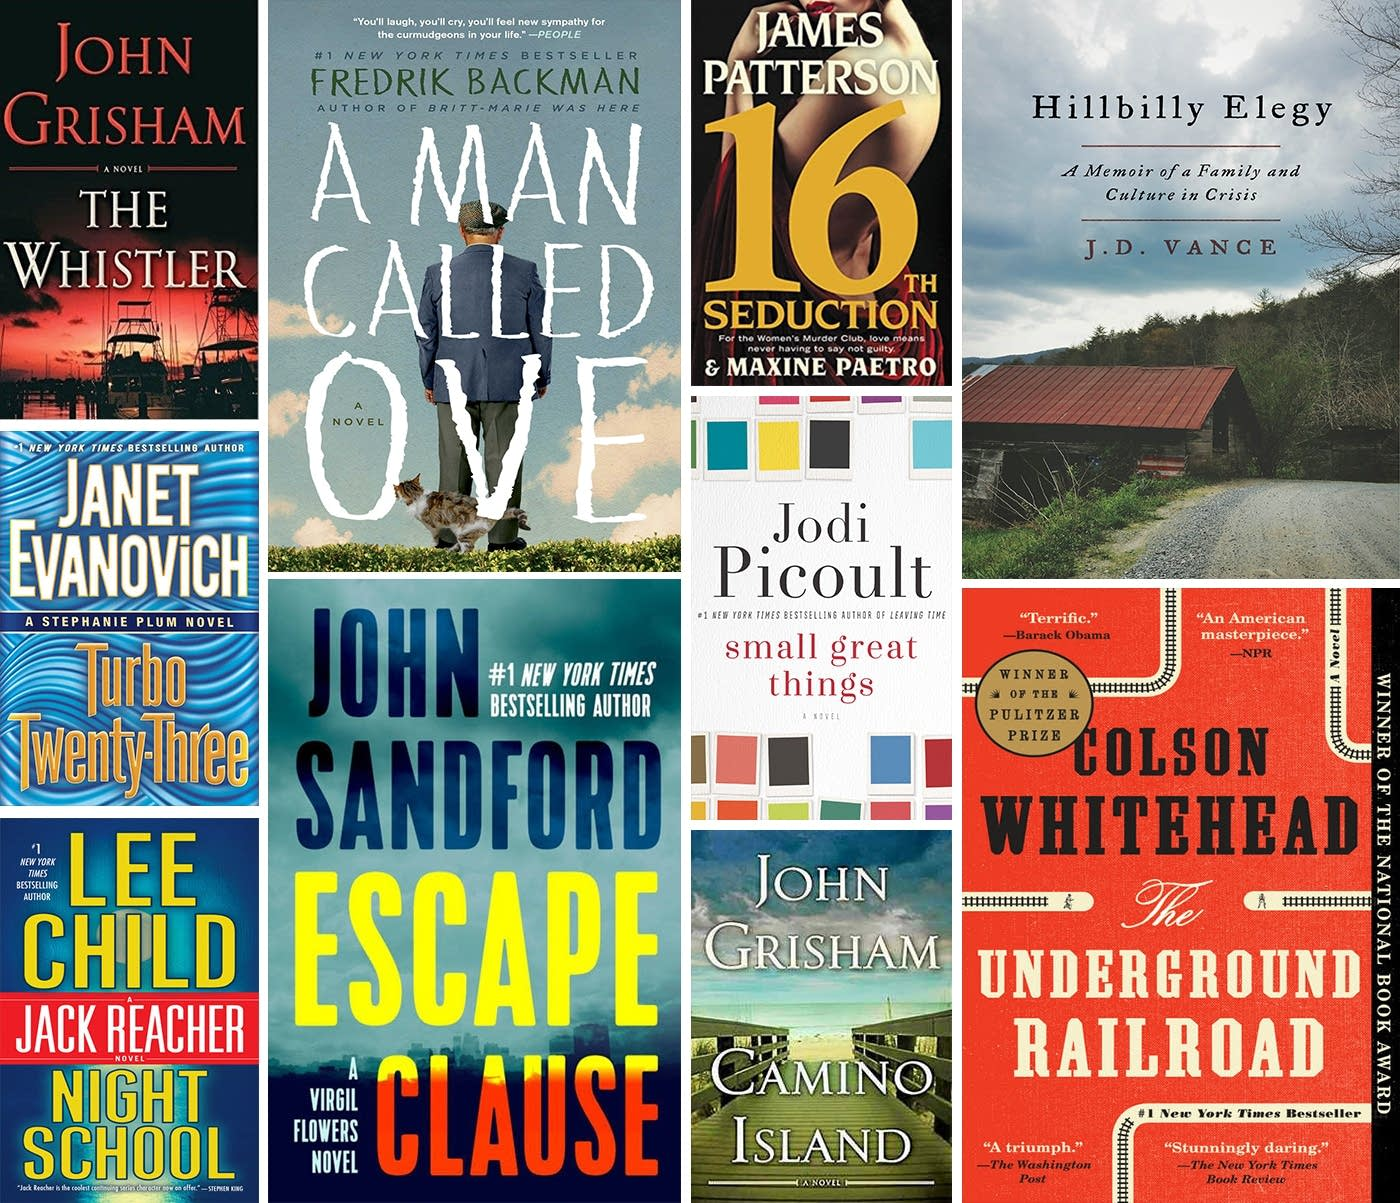 Winona Public Library favorites for 2017